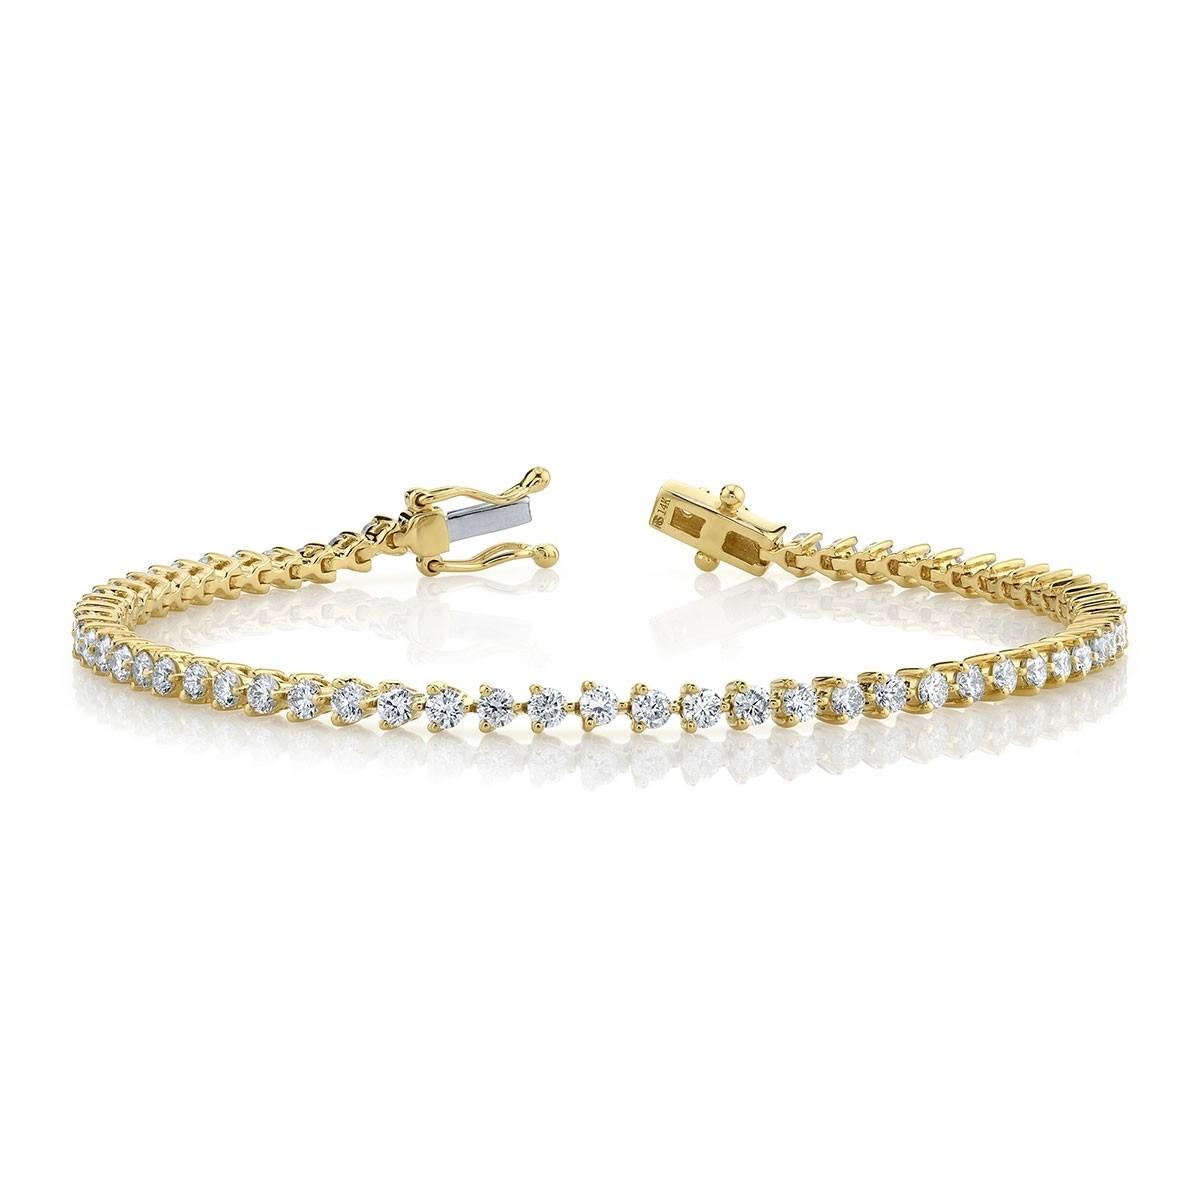 14k Yellow Gold 3 Prong 2.5CT Diamond Tennis Bracelet